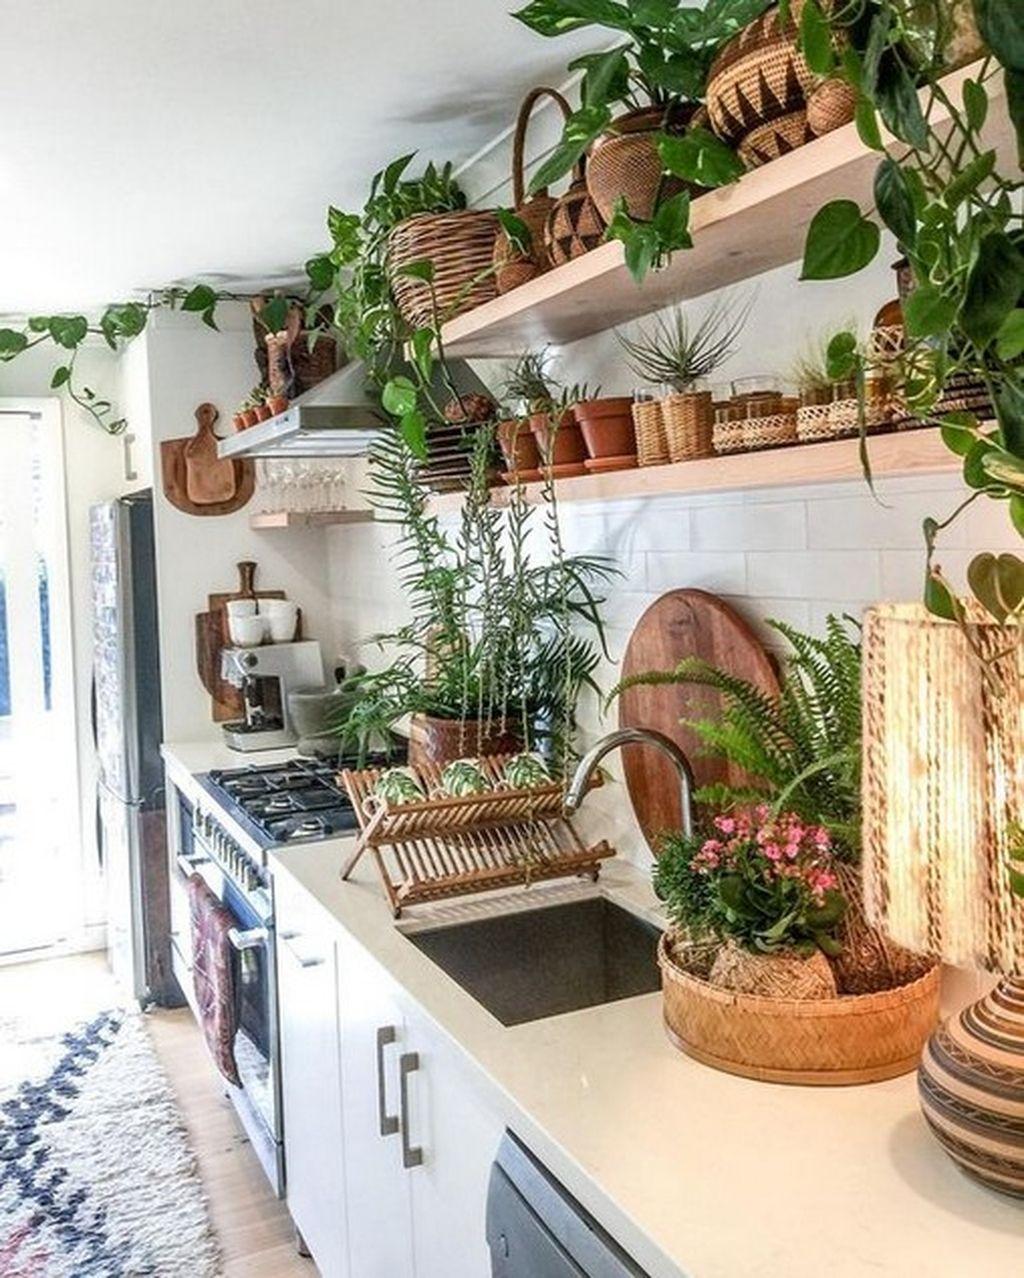 10 Unique Small Kitchen Design Ideas: 20+ Unusual Bohemian Kitchen Decorations Ideas To Try